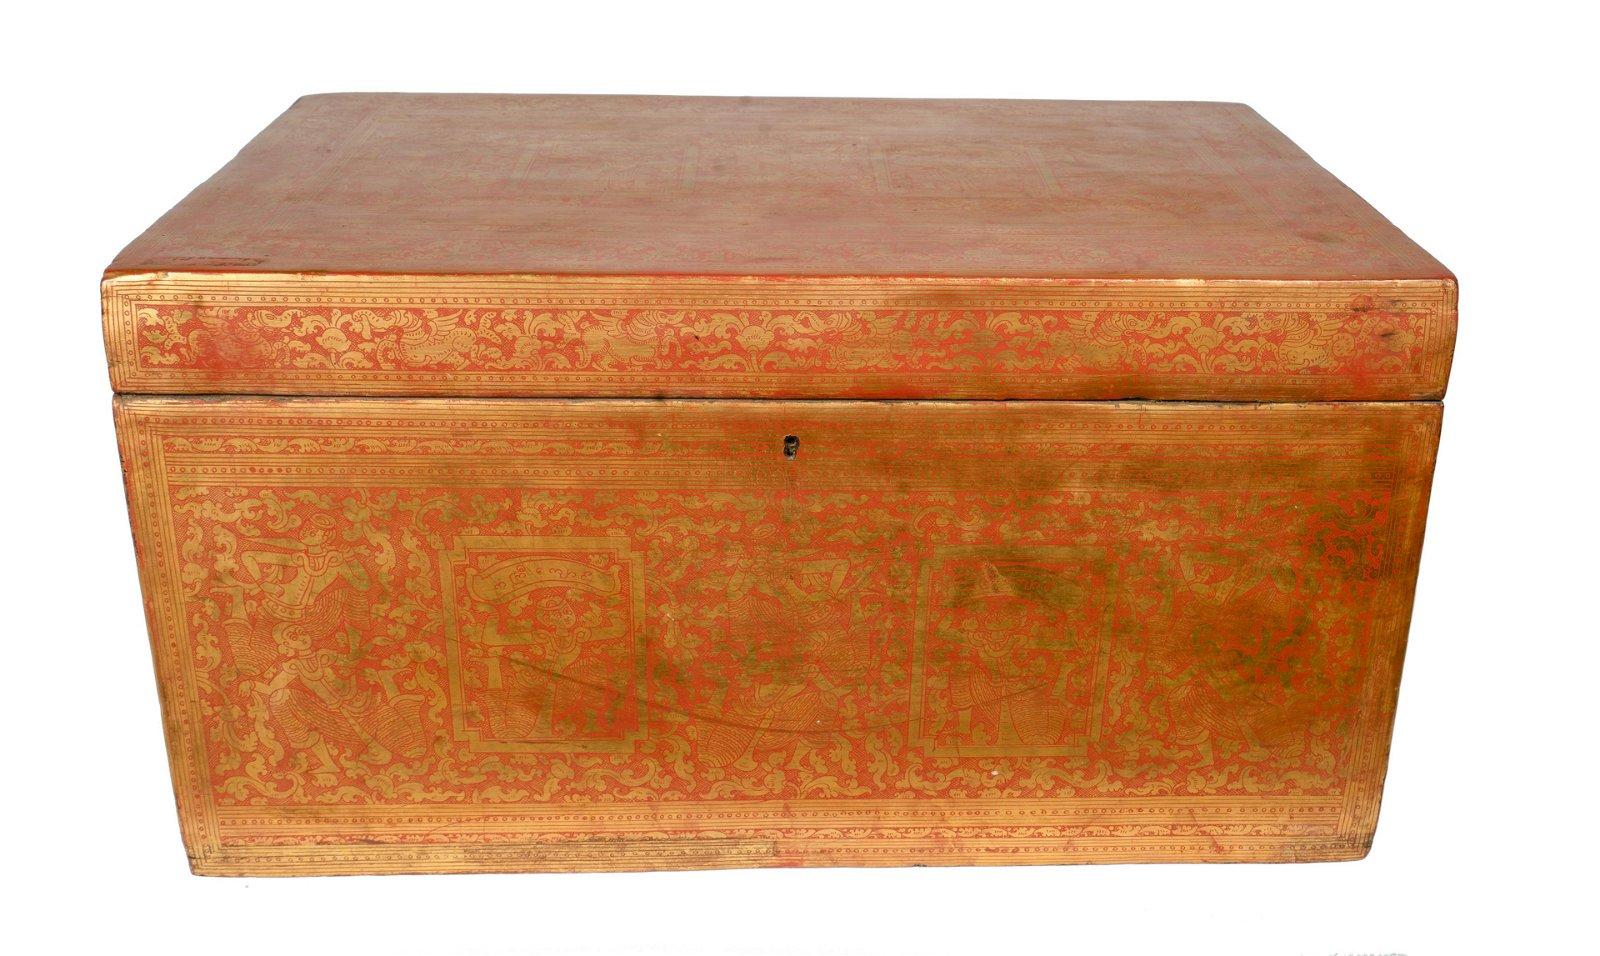 19th Century Burmese Sadaik or Lacquer Manuscript Box